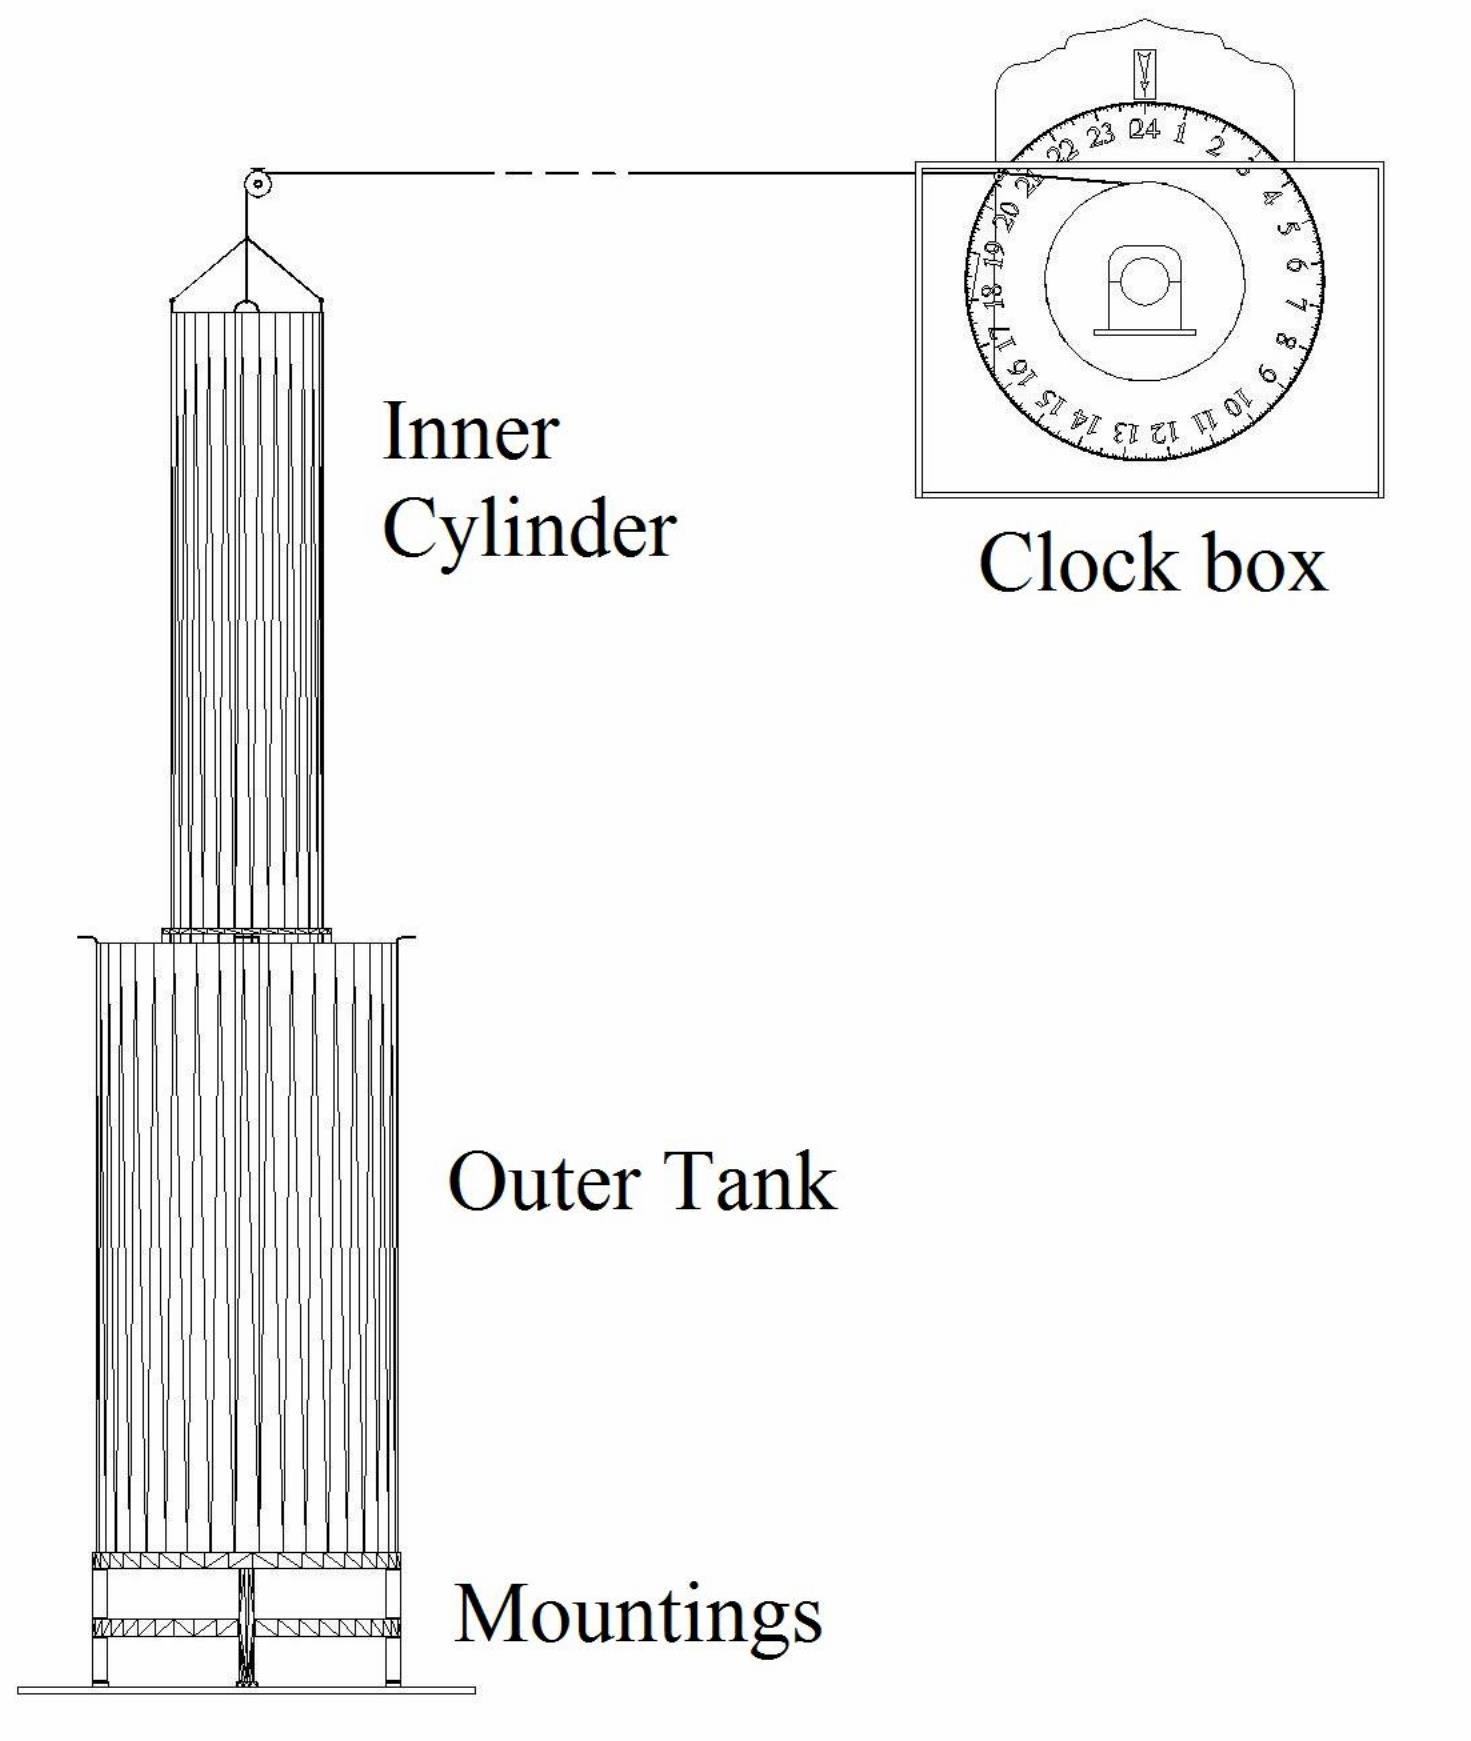 a water clock